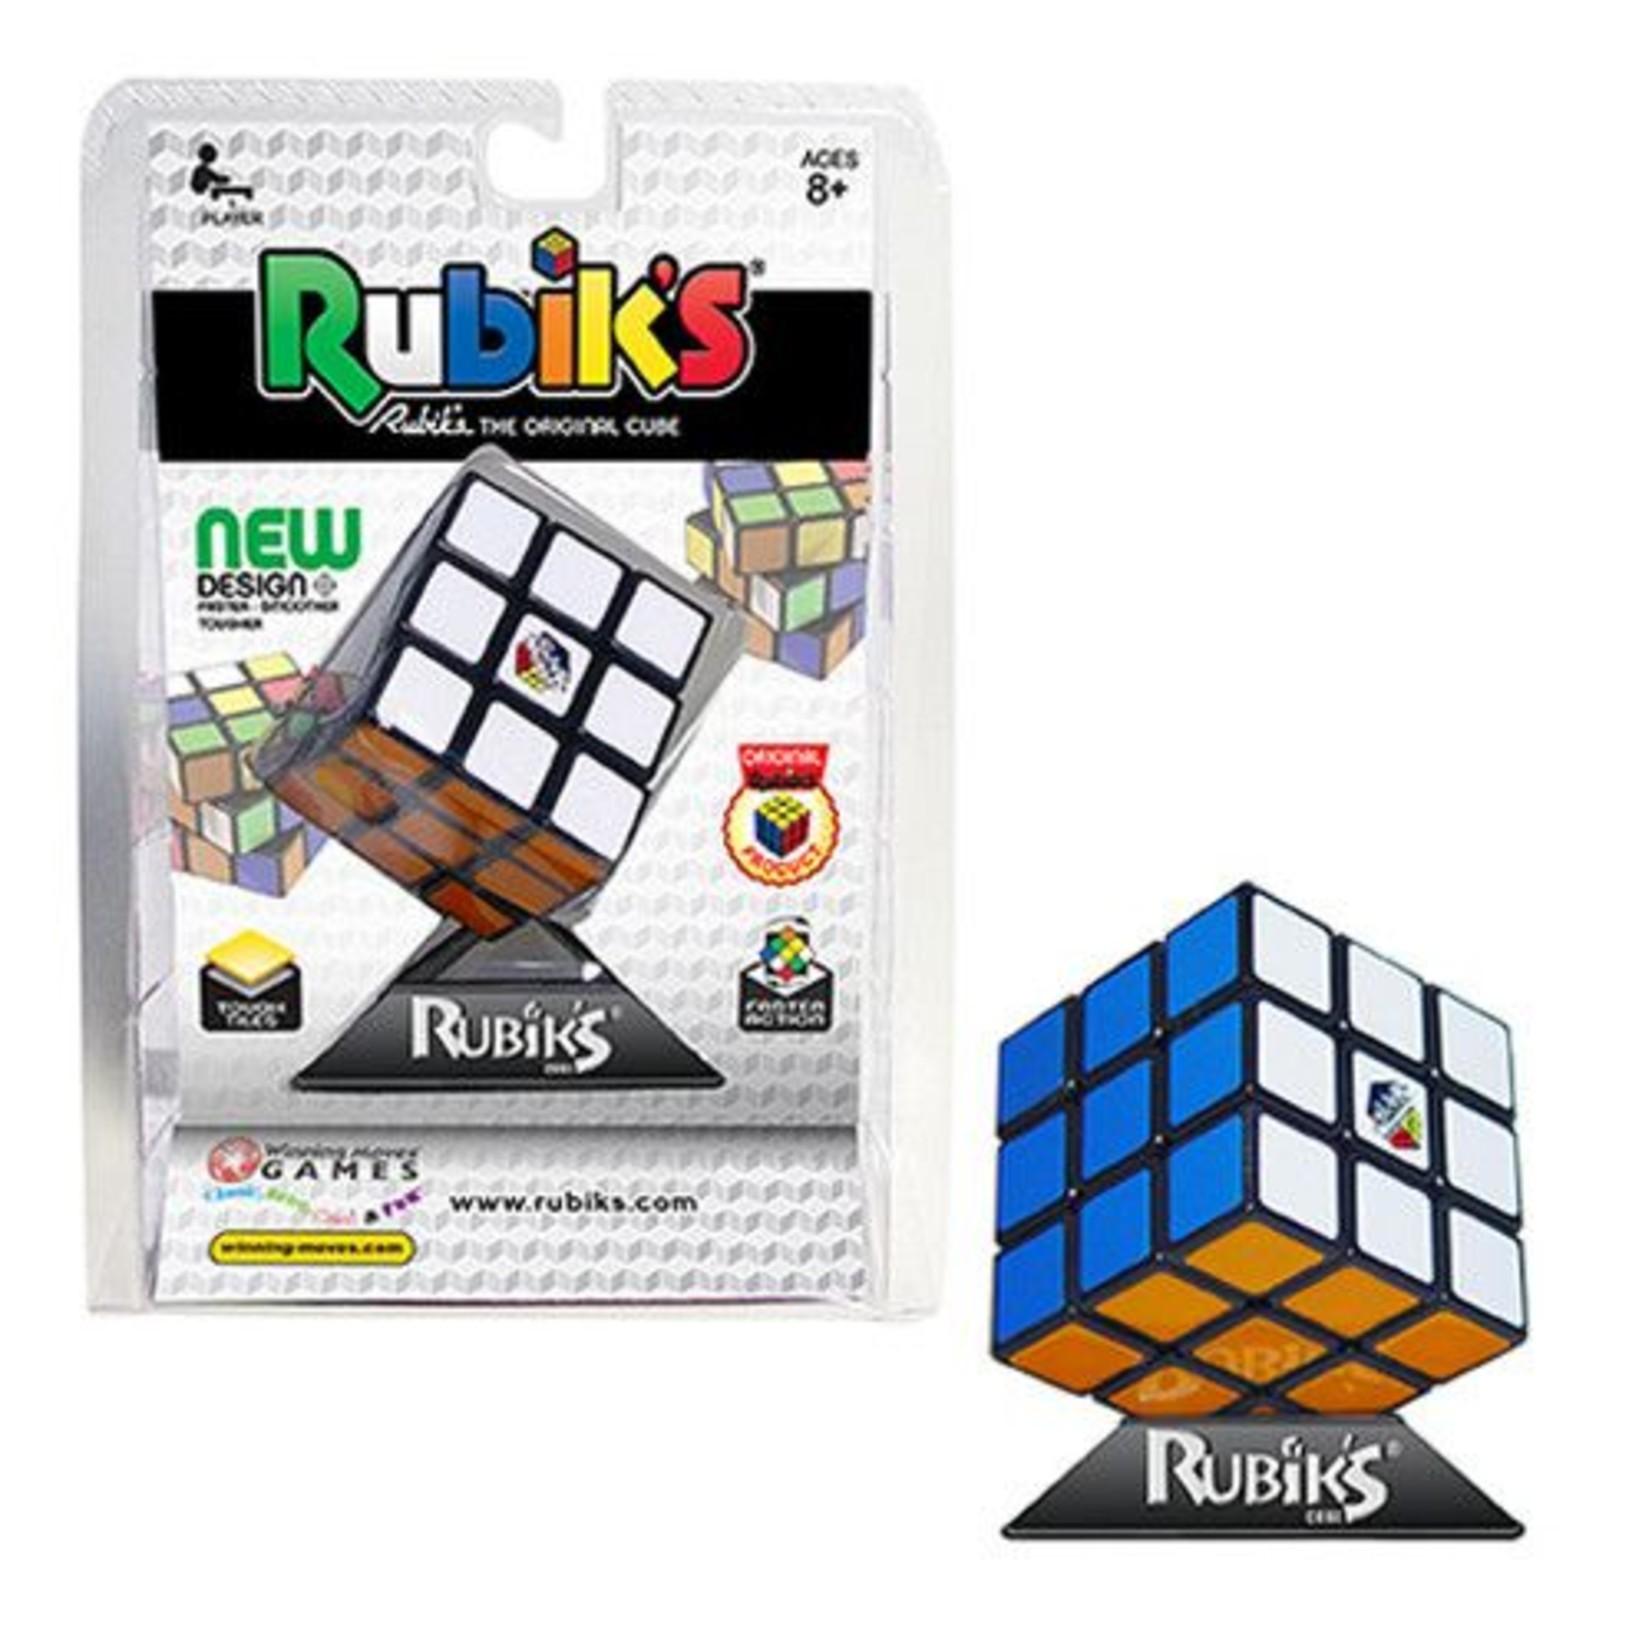 Rubik's Rubiks Cube 3x3